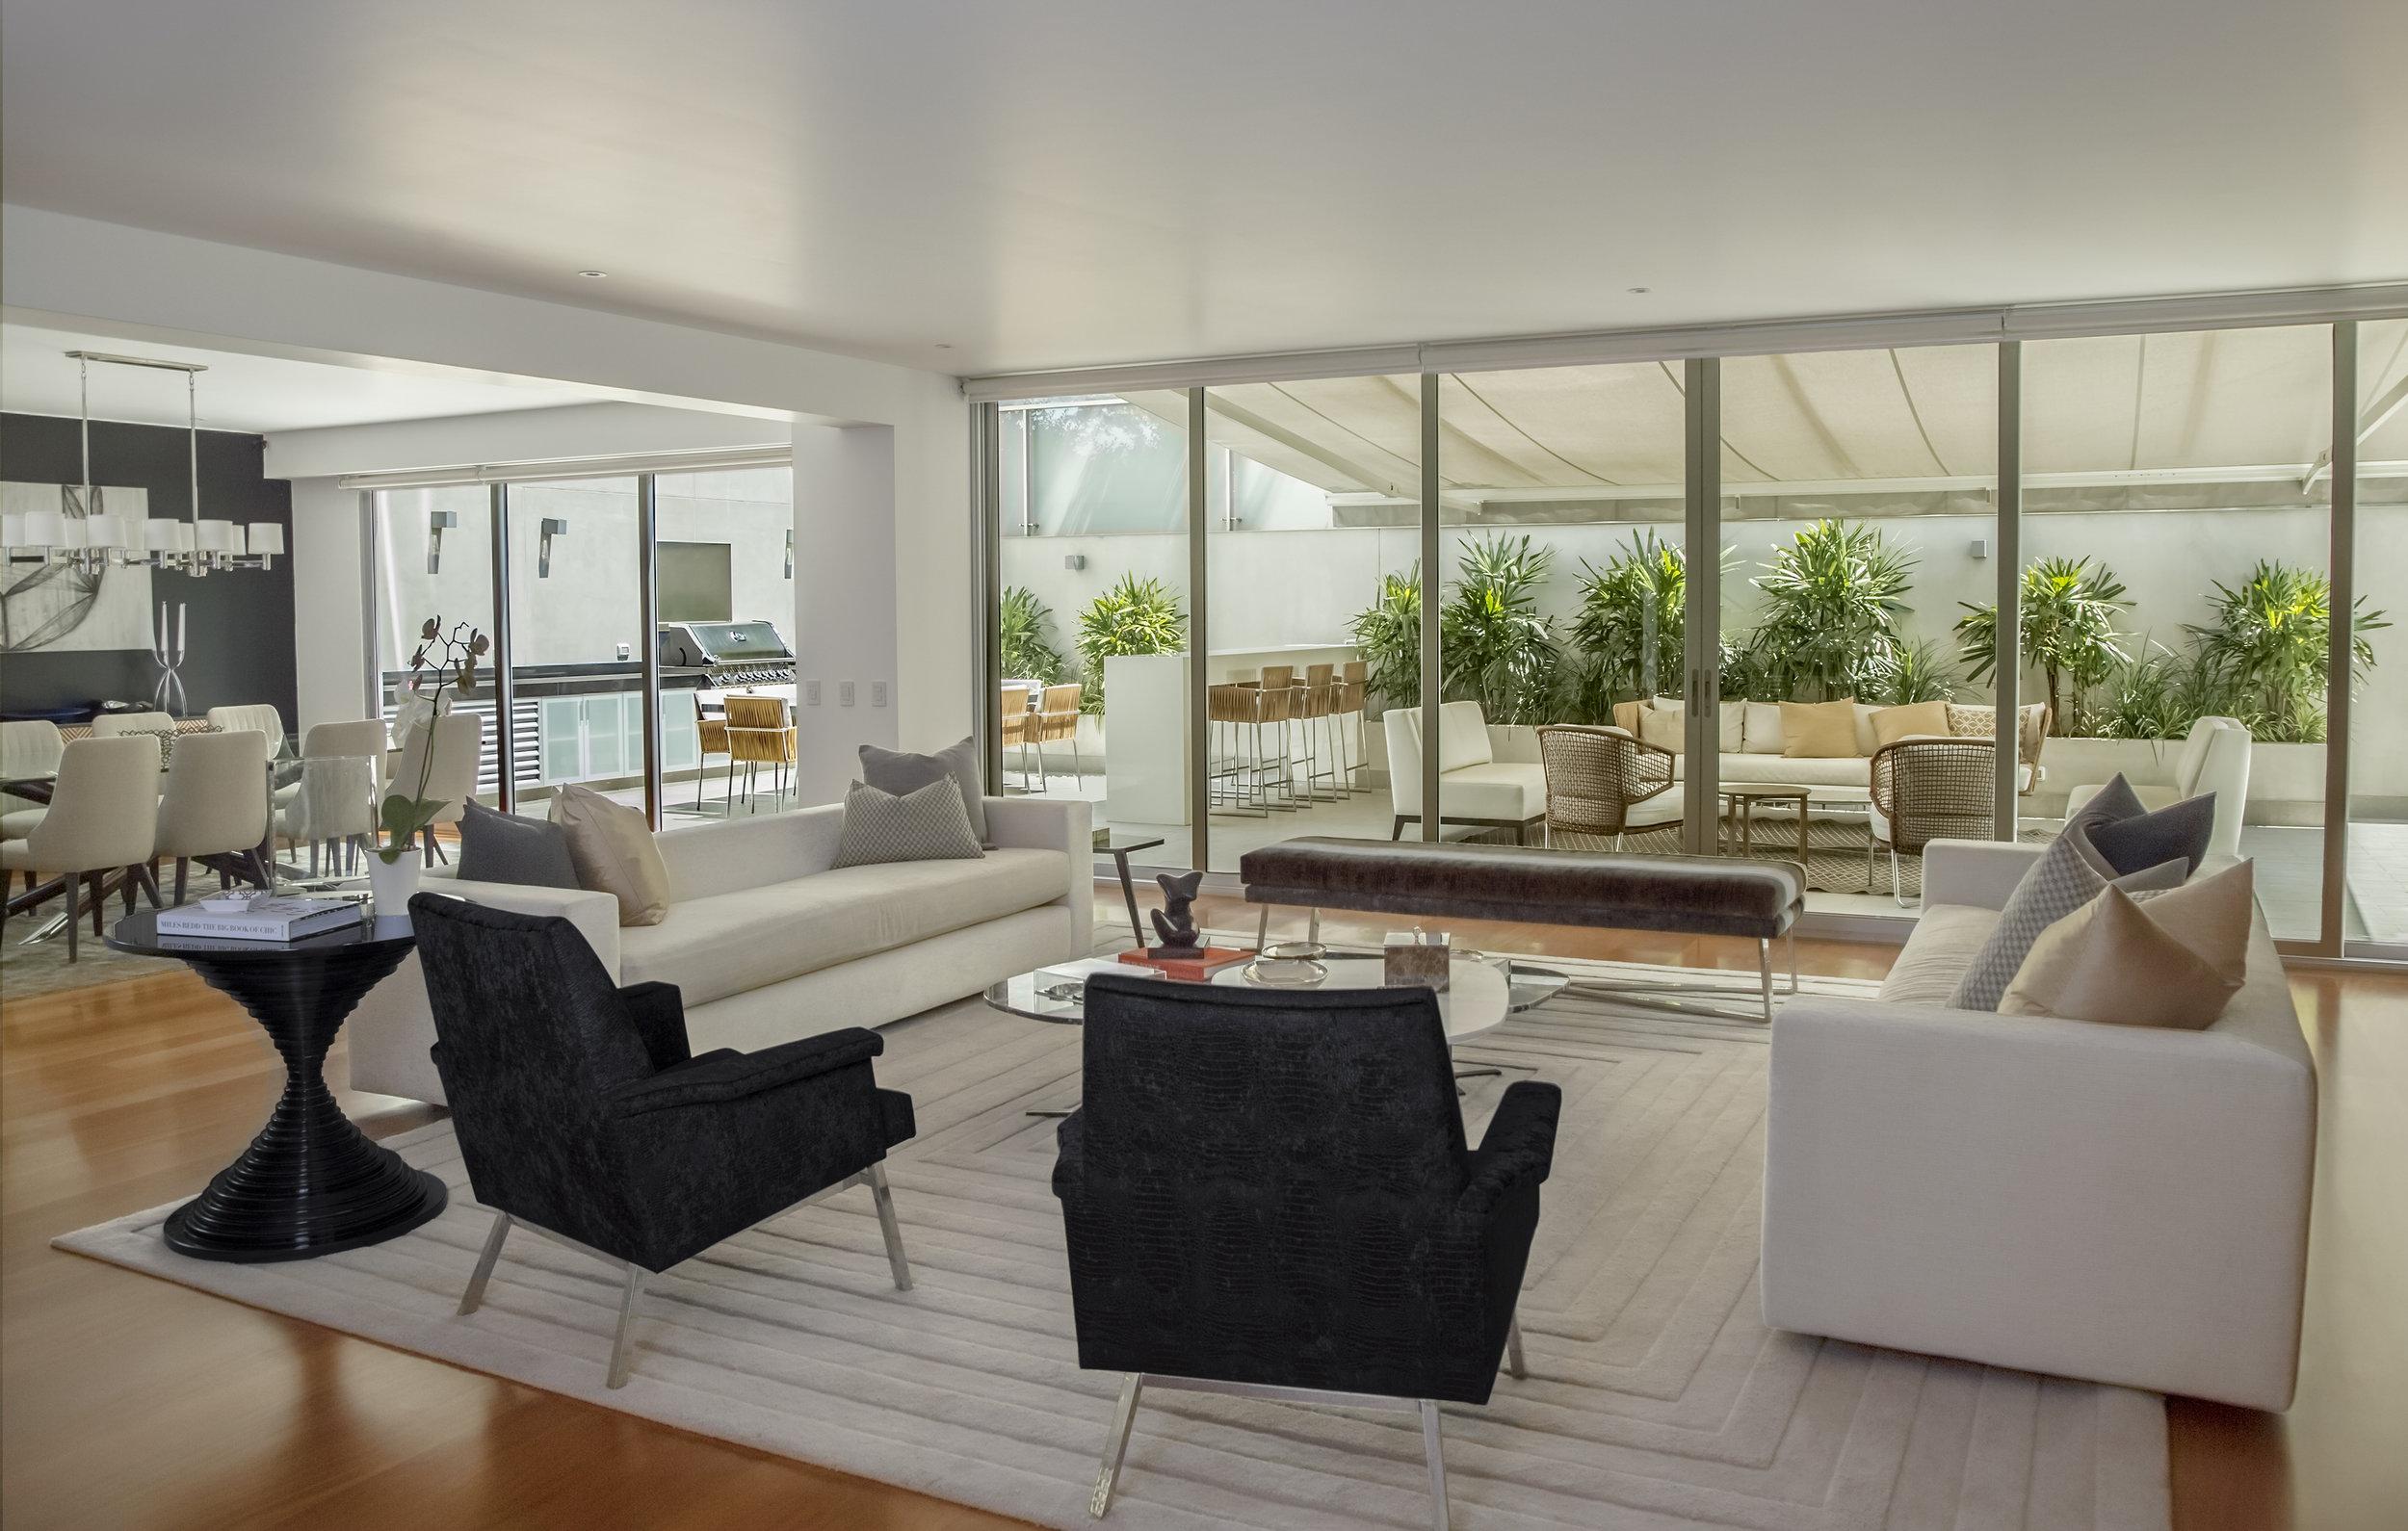 Top 5 Luxury Interior Design Trends That Will Kick Start 2019